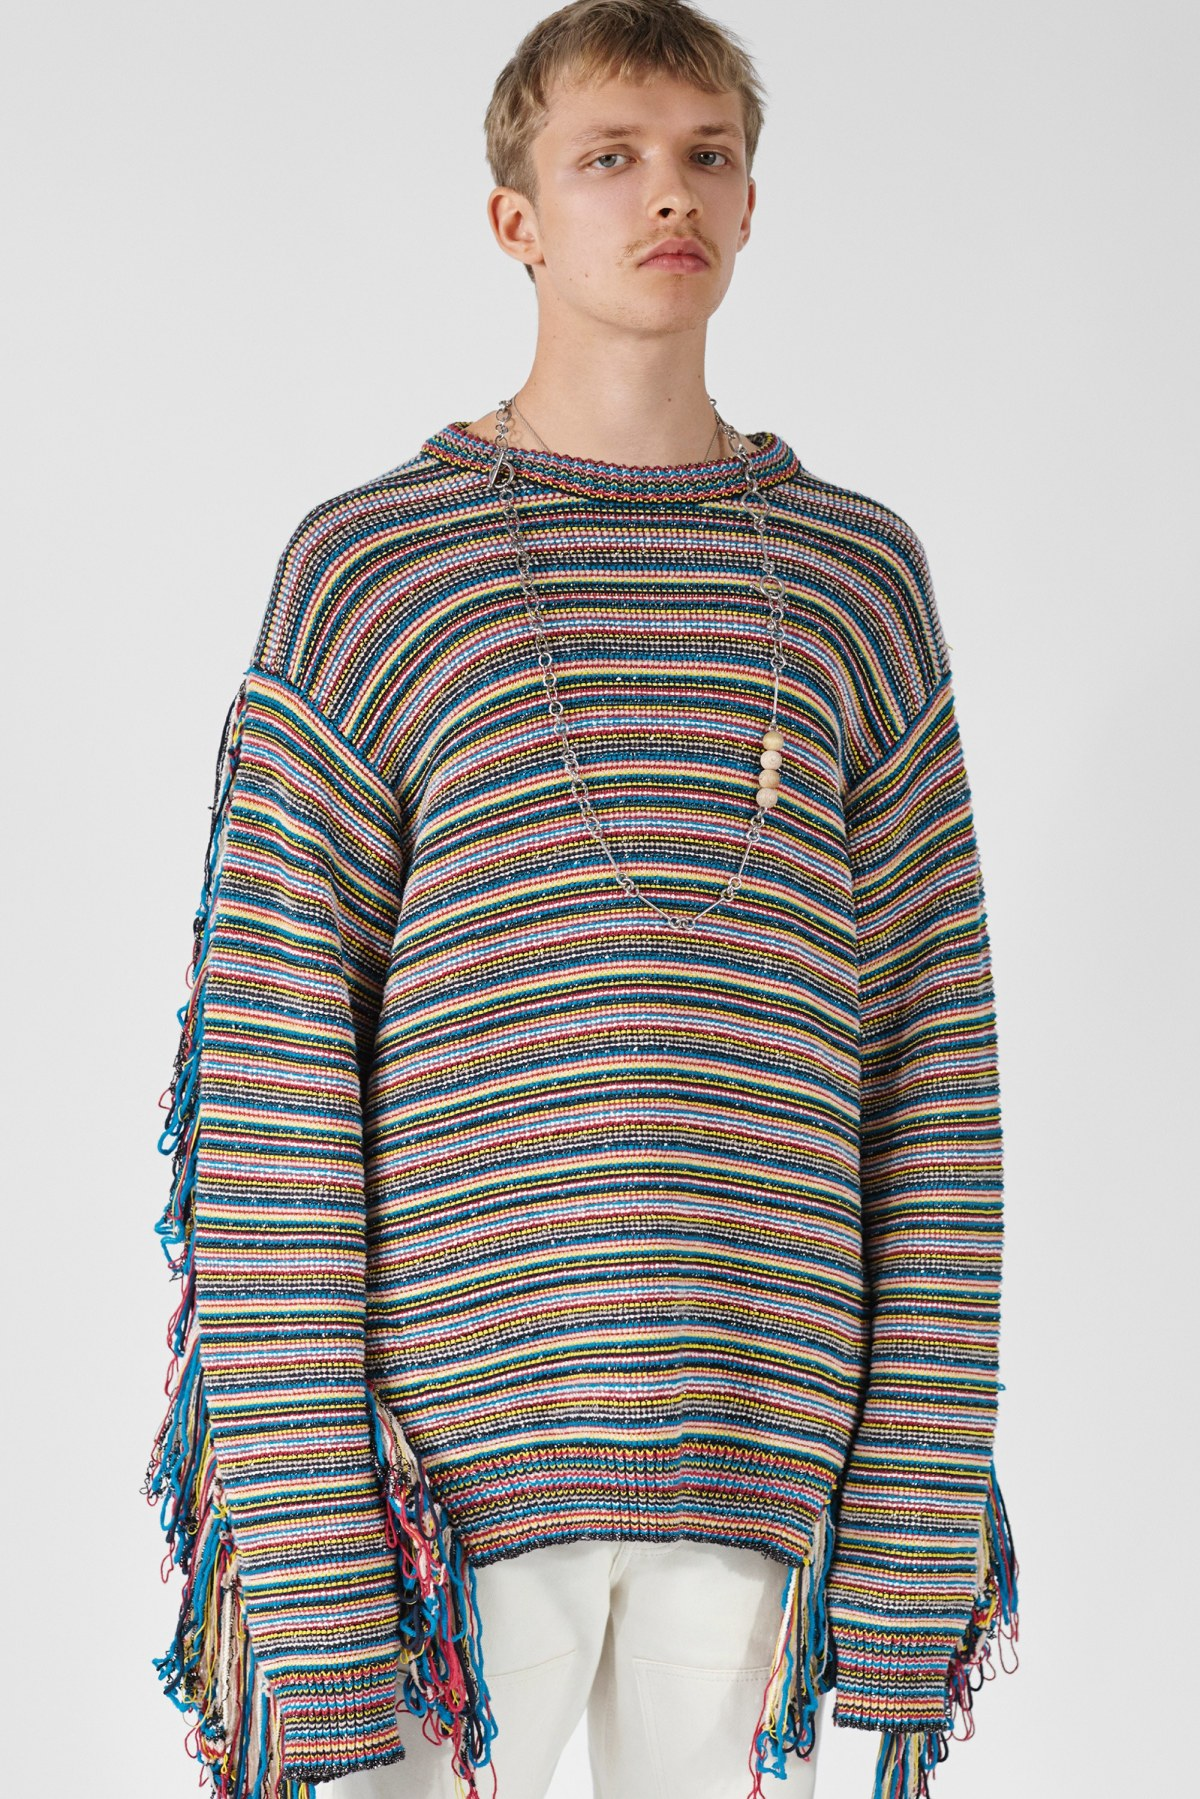 stella-mccartney-spring-2017-mens-fashion-show-the-impression-20